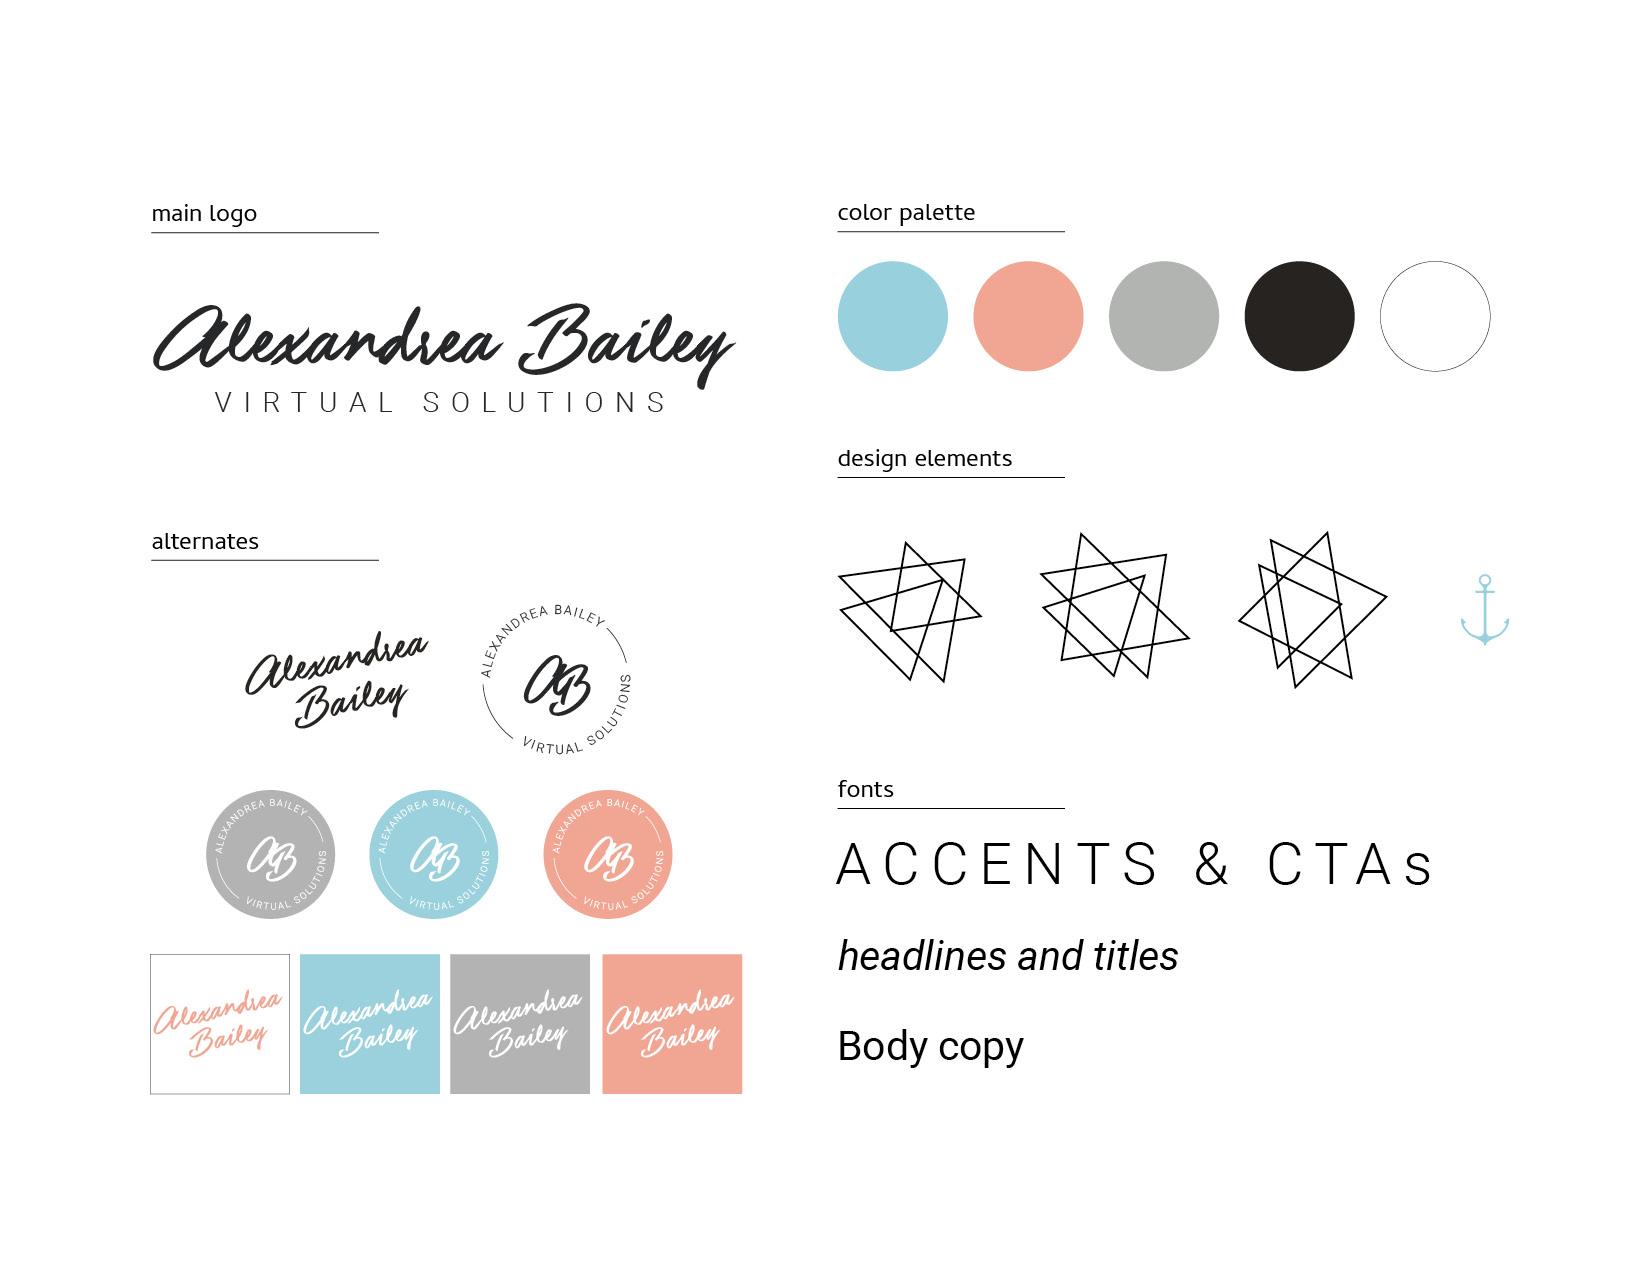 Alexandrea Bailey Design Elements